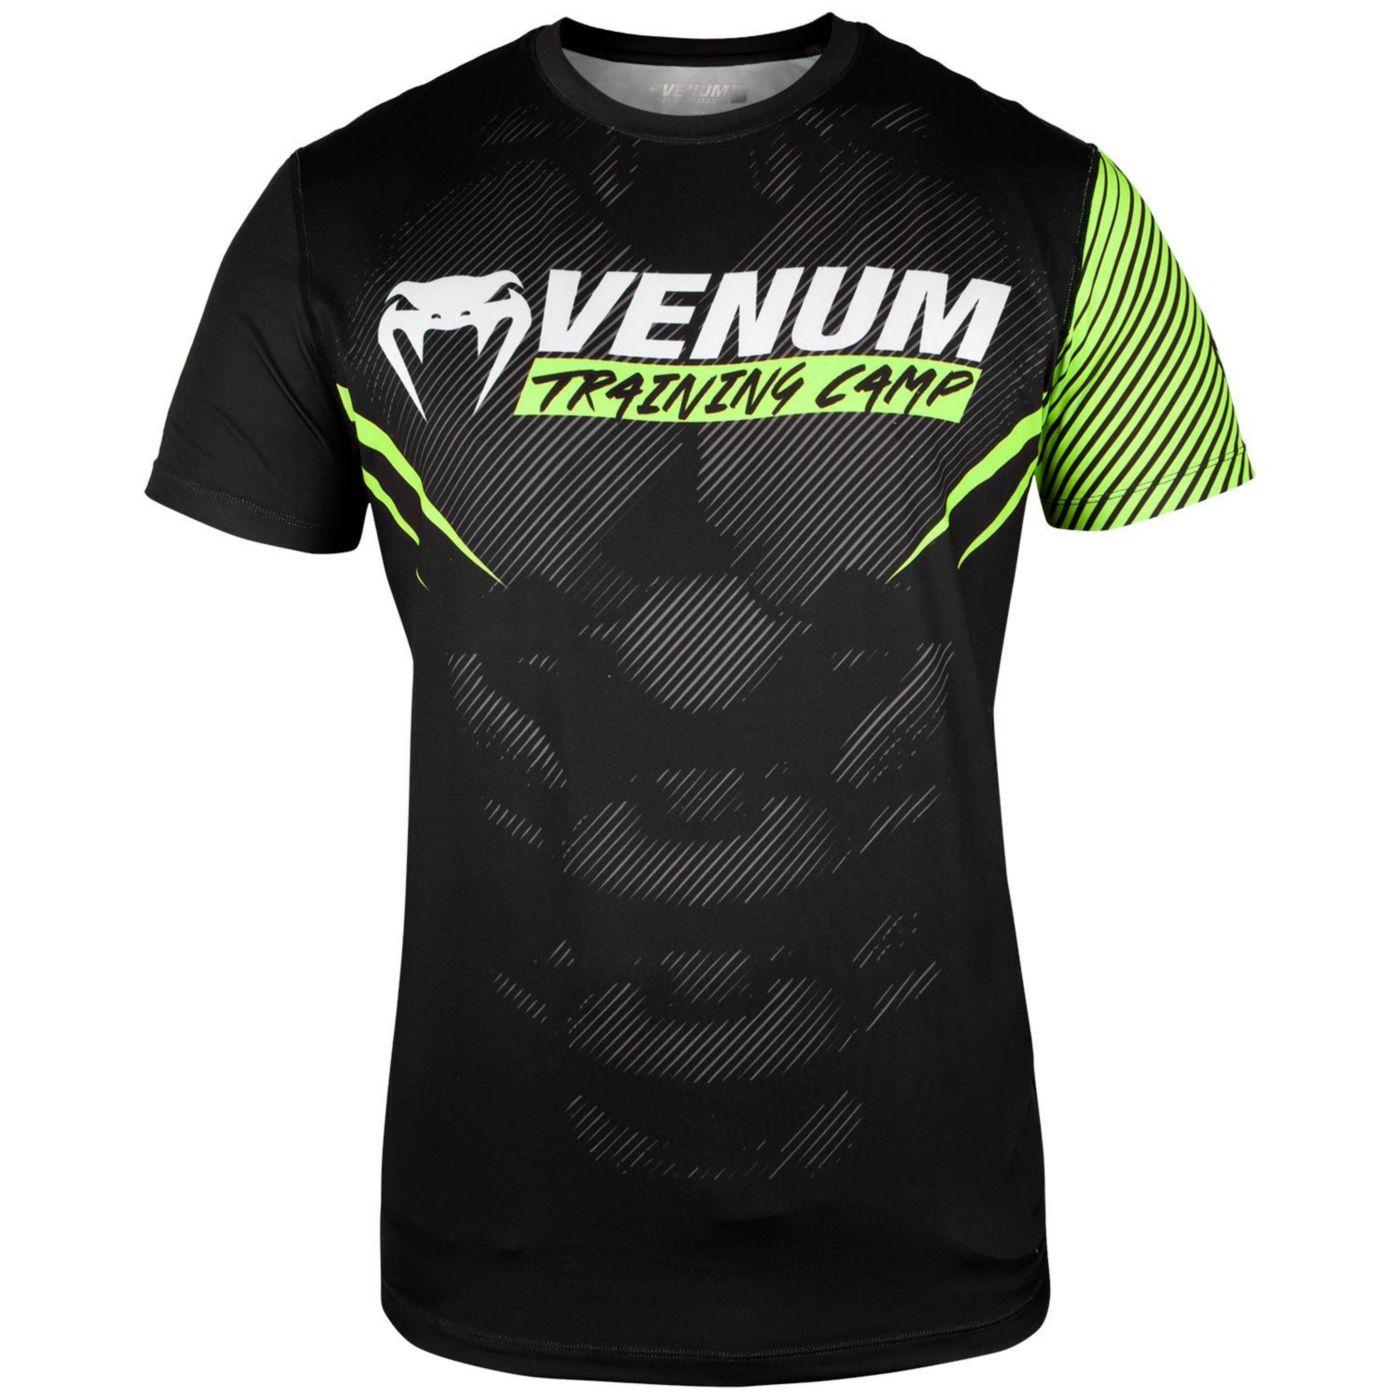 Venum Training Camp 2.0 T-Shirt